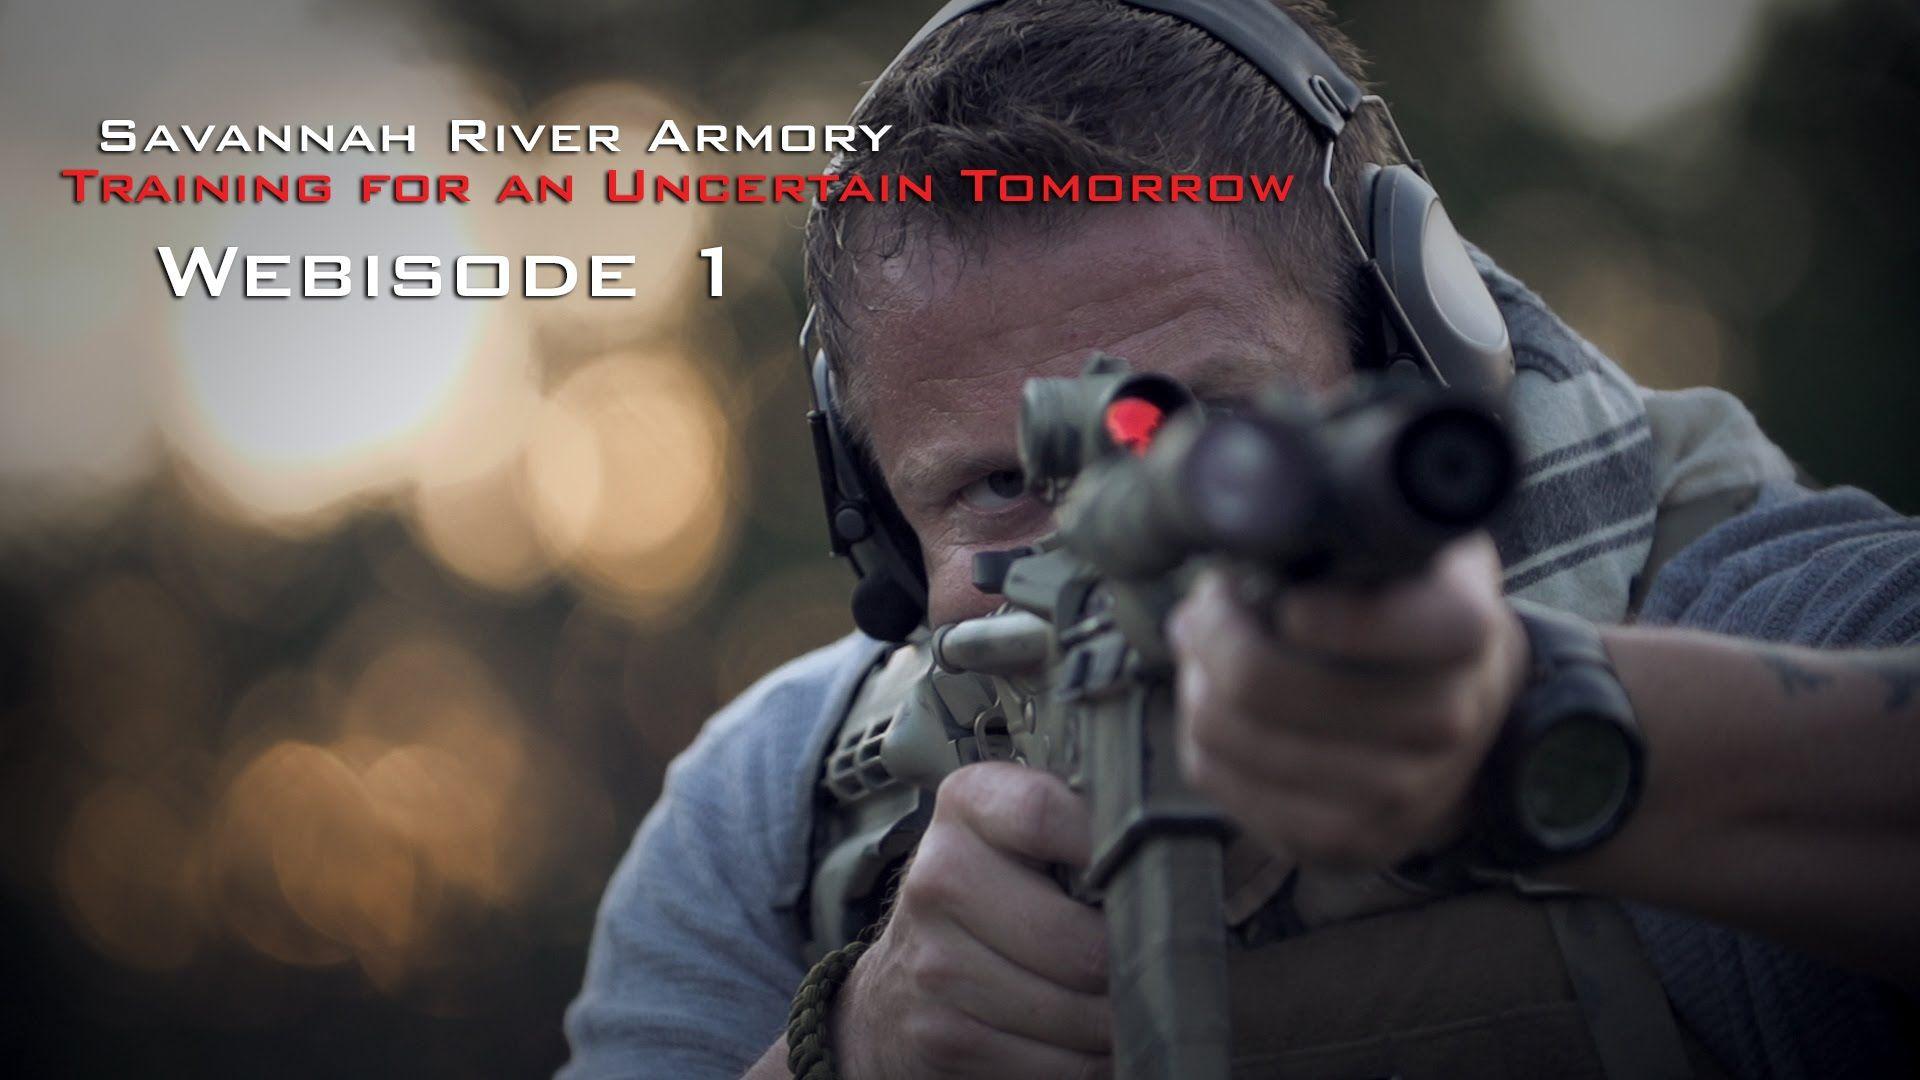 SRA - Training for an Uncertain Tomorrow 001